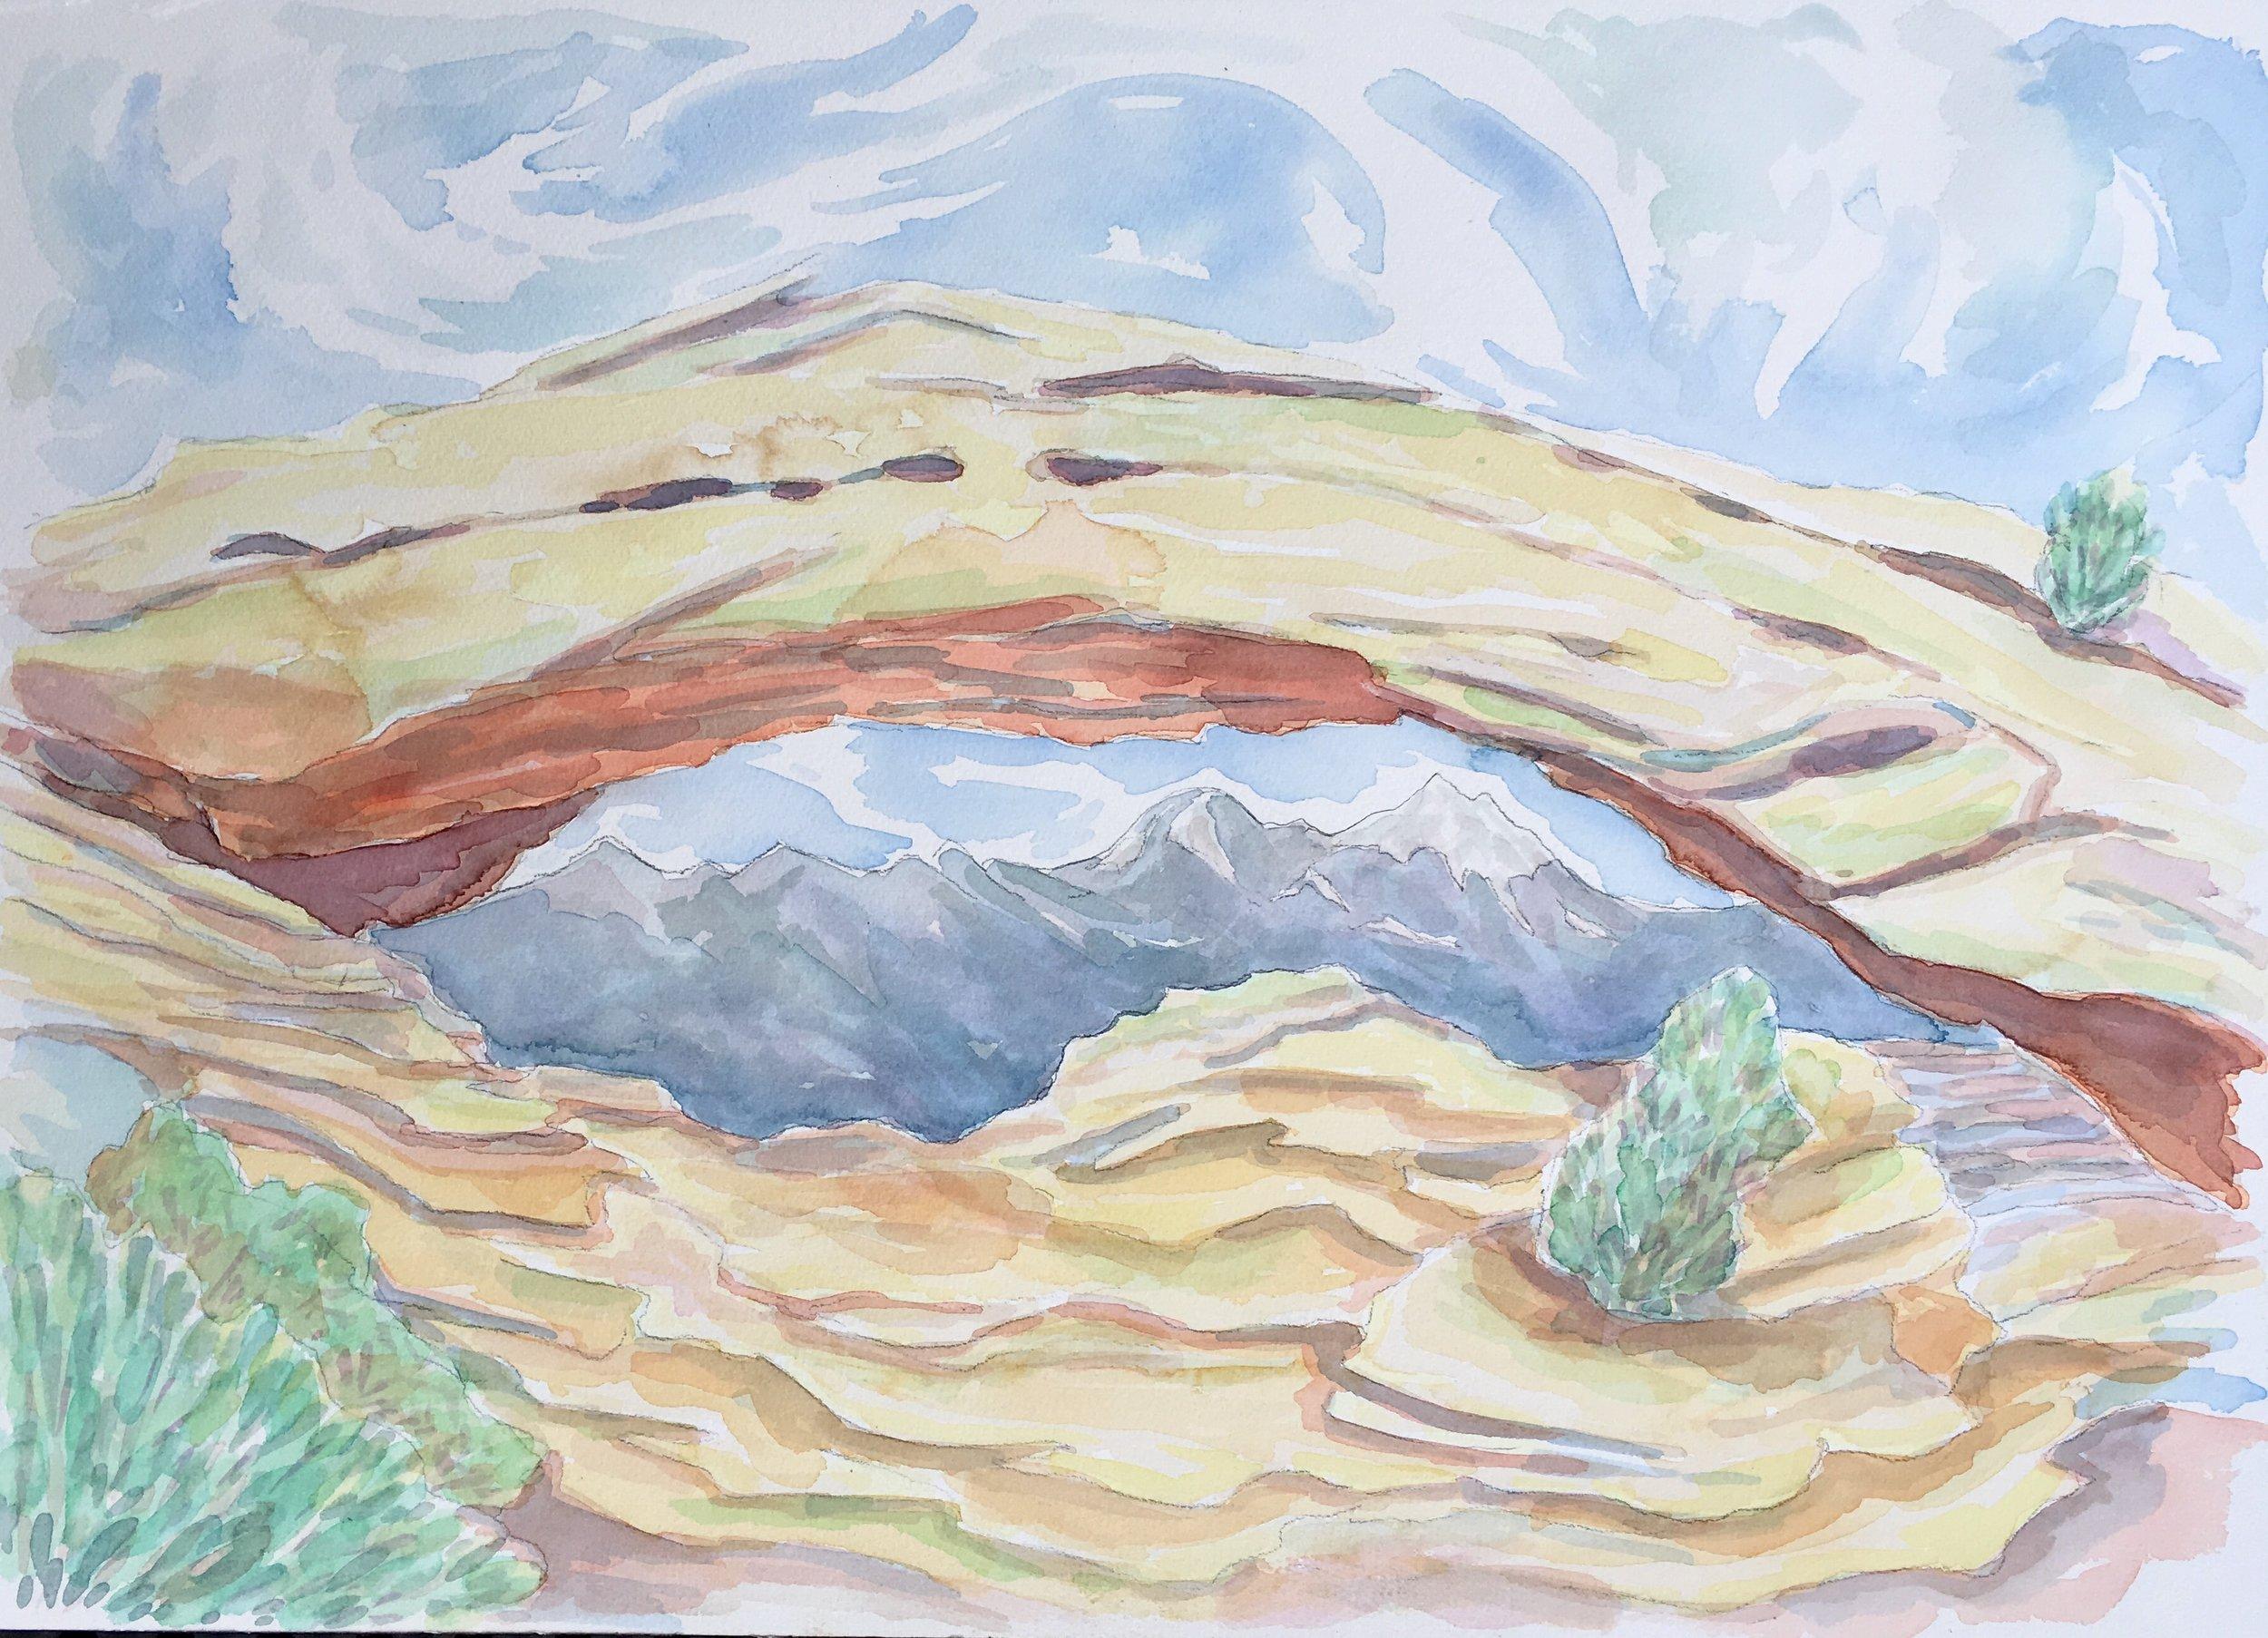 Mesa Arch, Canyonlands National Park - watercolor